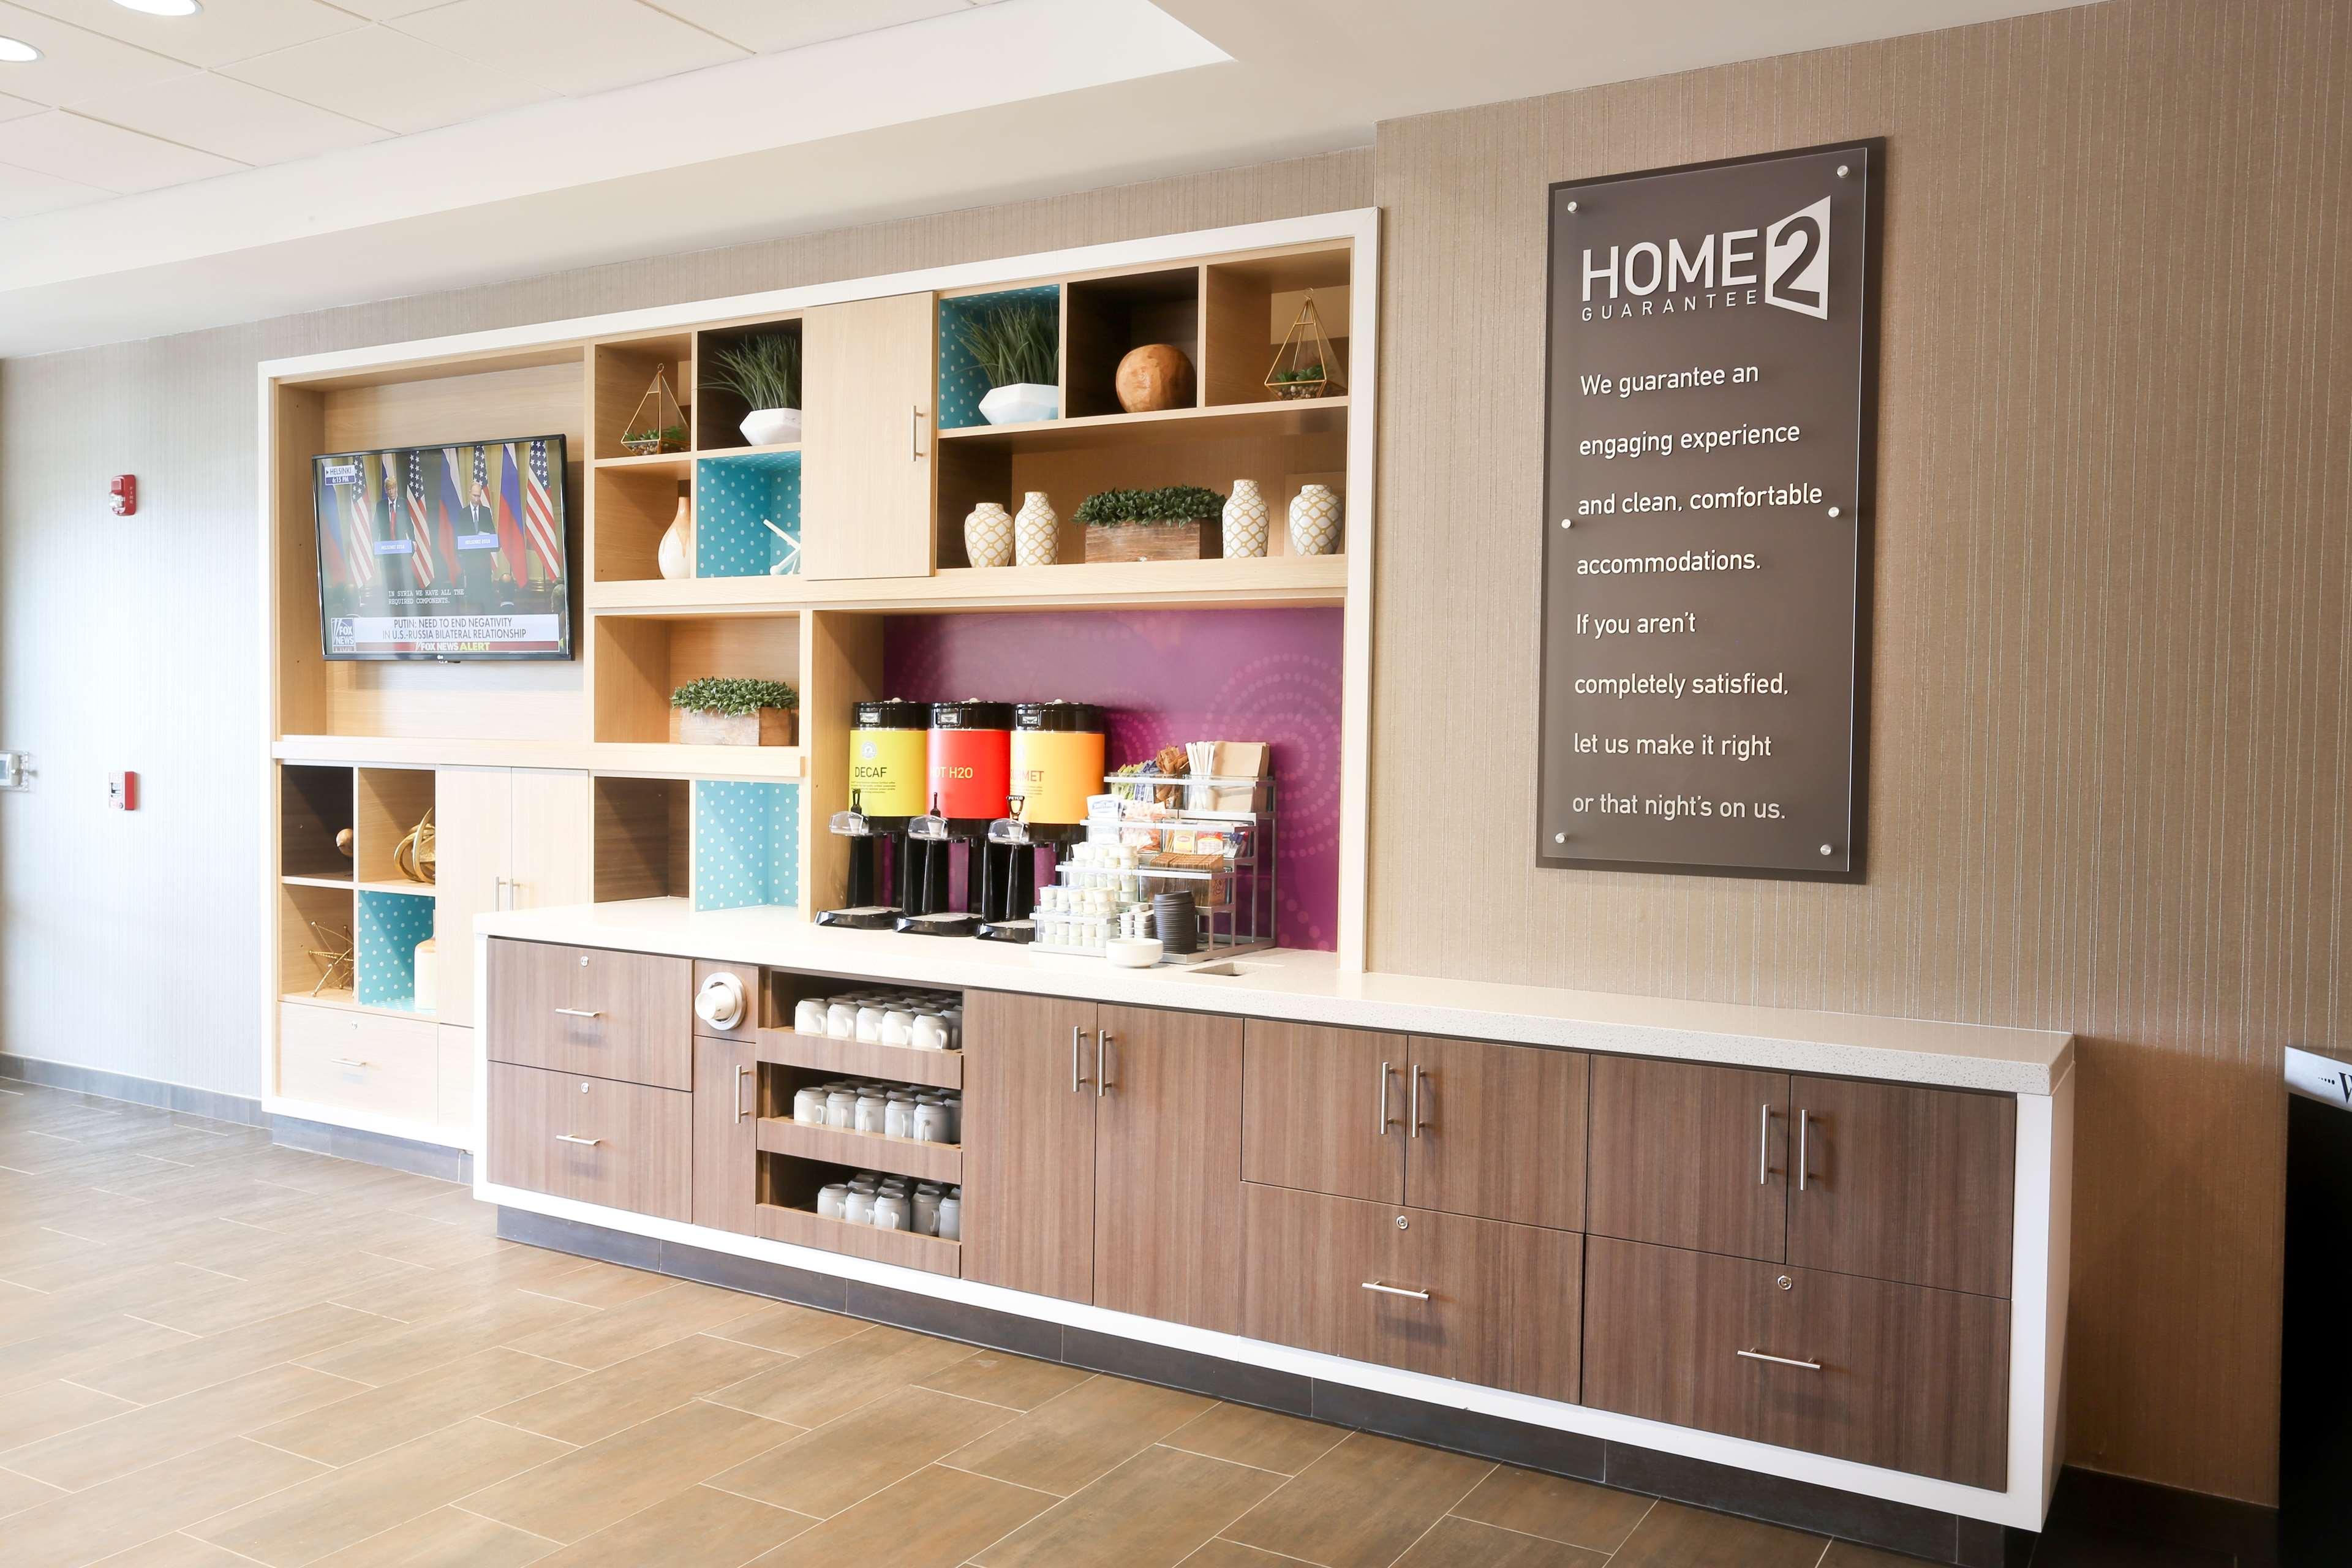 Home2 Suites by Hilton Bordentown image 14